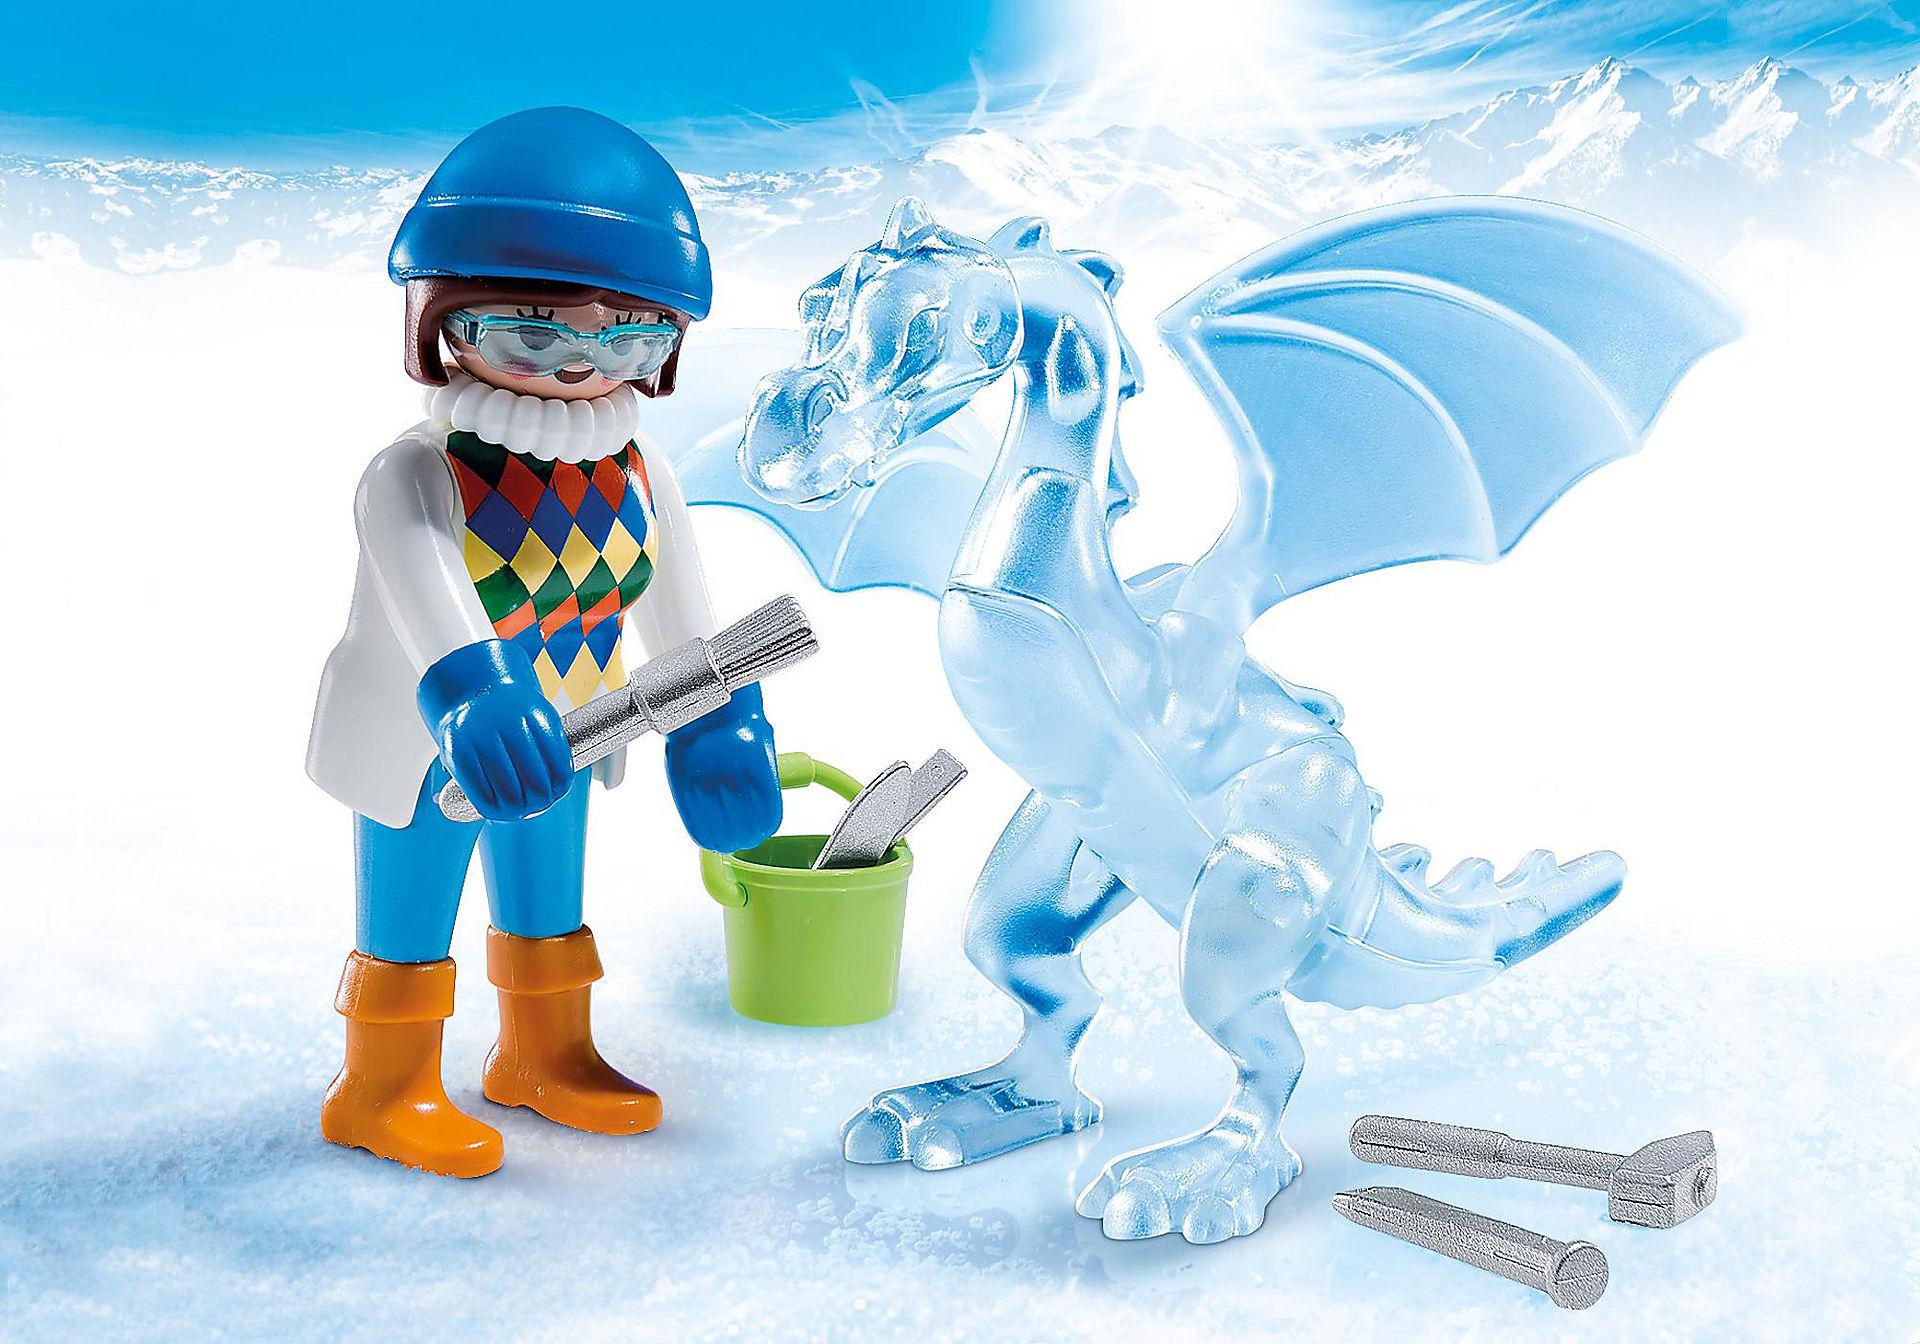 http://media.playmobil.com/i/playmobil/5374_product_detail/Künstlerin mit Eisskulptur